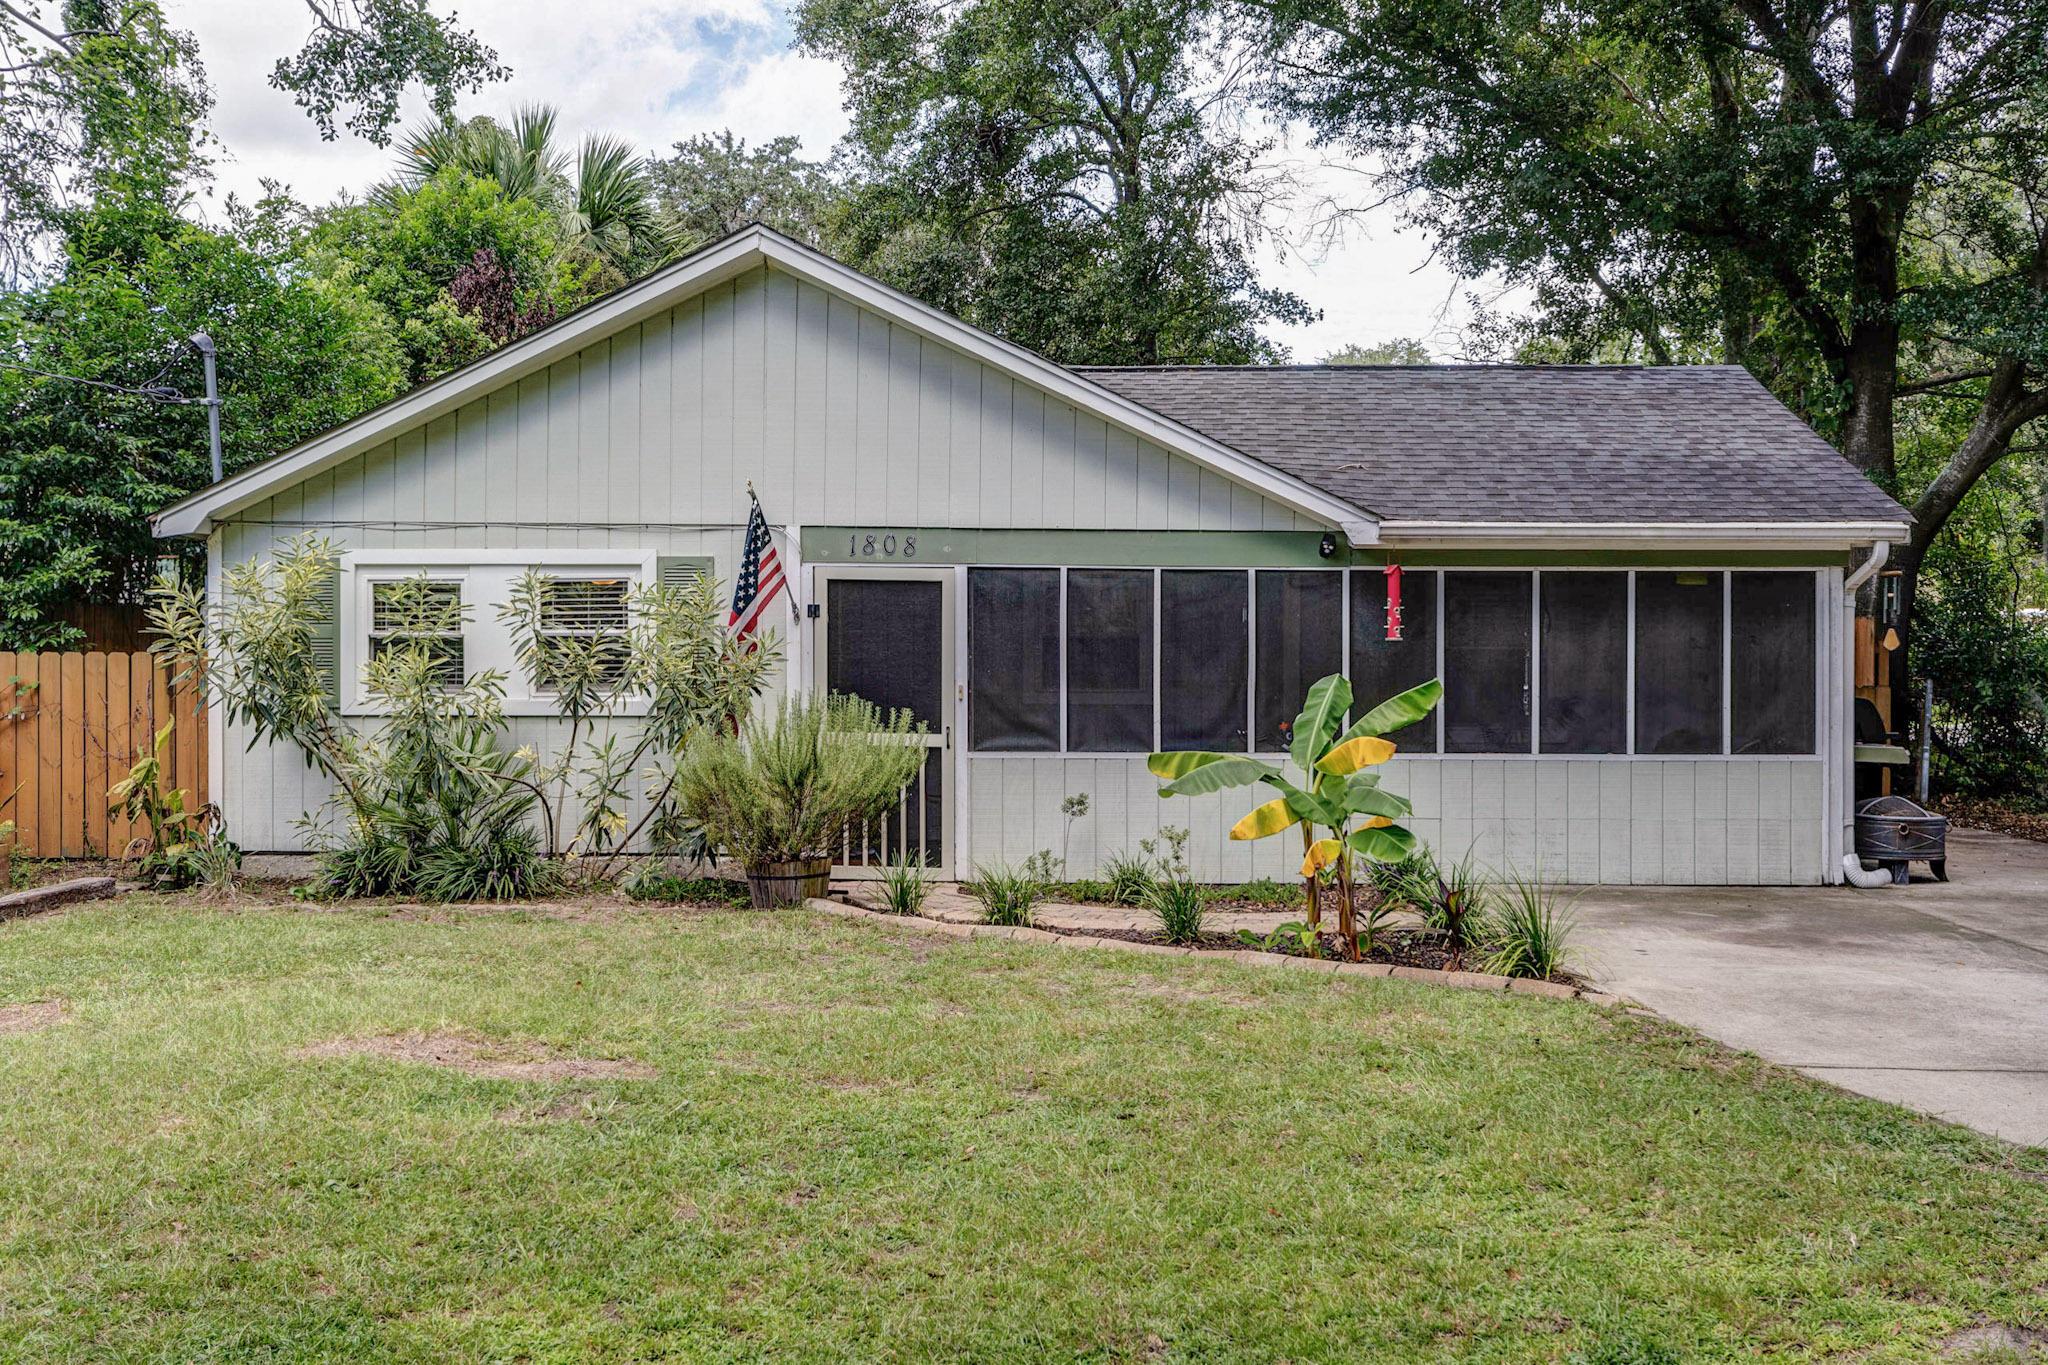 St Andrews Homes For Sale - 1808 2nd, Charleston, SC - 2